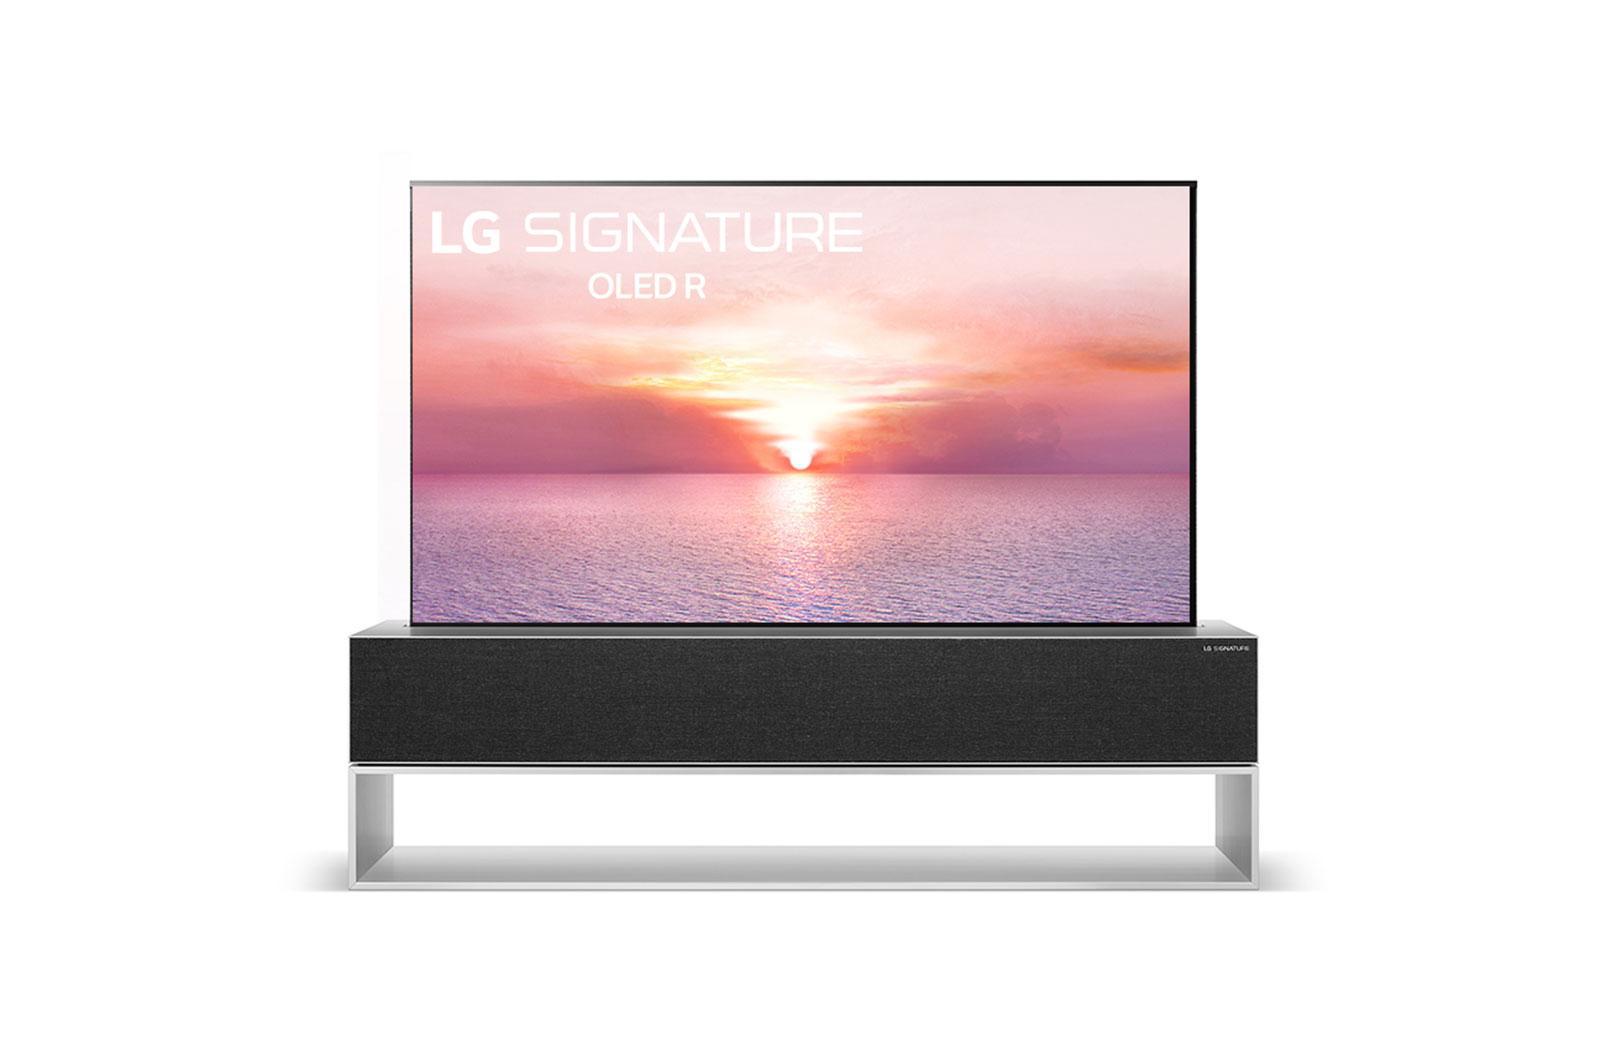 LG SIGNATURE OLED R 65'' Class Rollable 4K Smart TV w/ AI ThinQ® (64.5'' Diag)